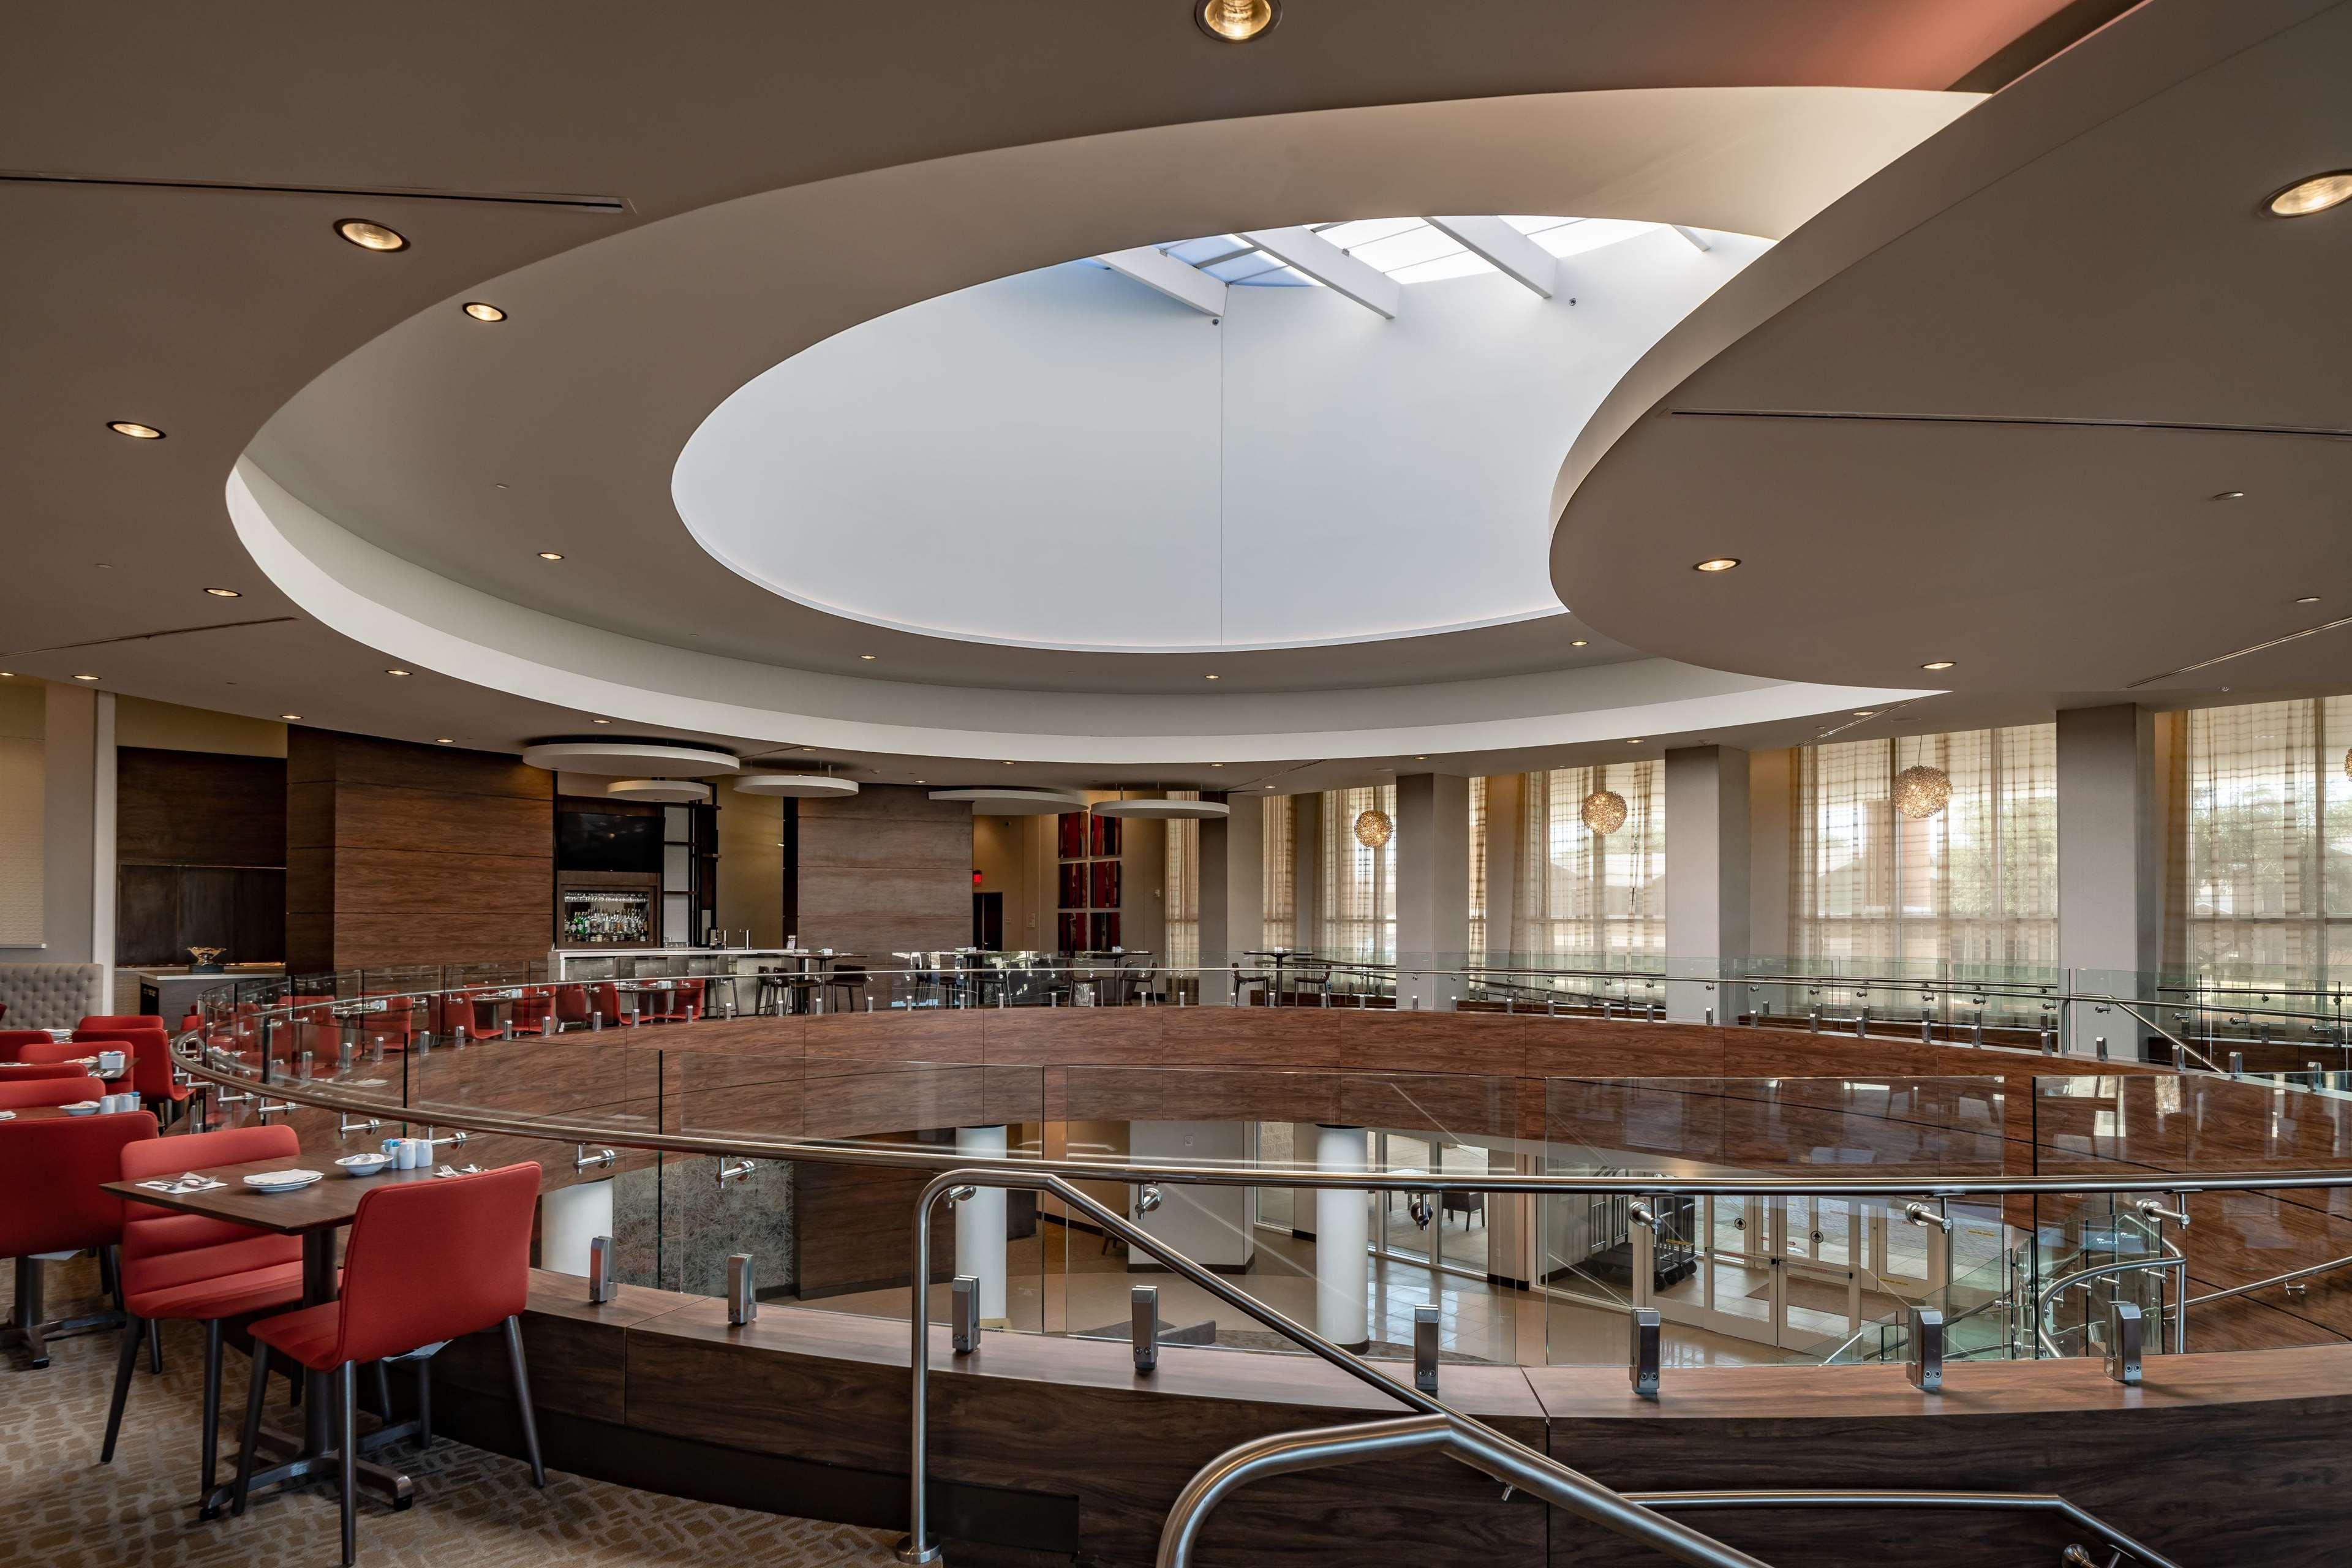 Hilton Garden Inn Dallas at Hurst Conference Center image 6